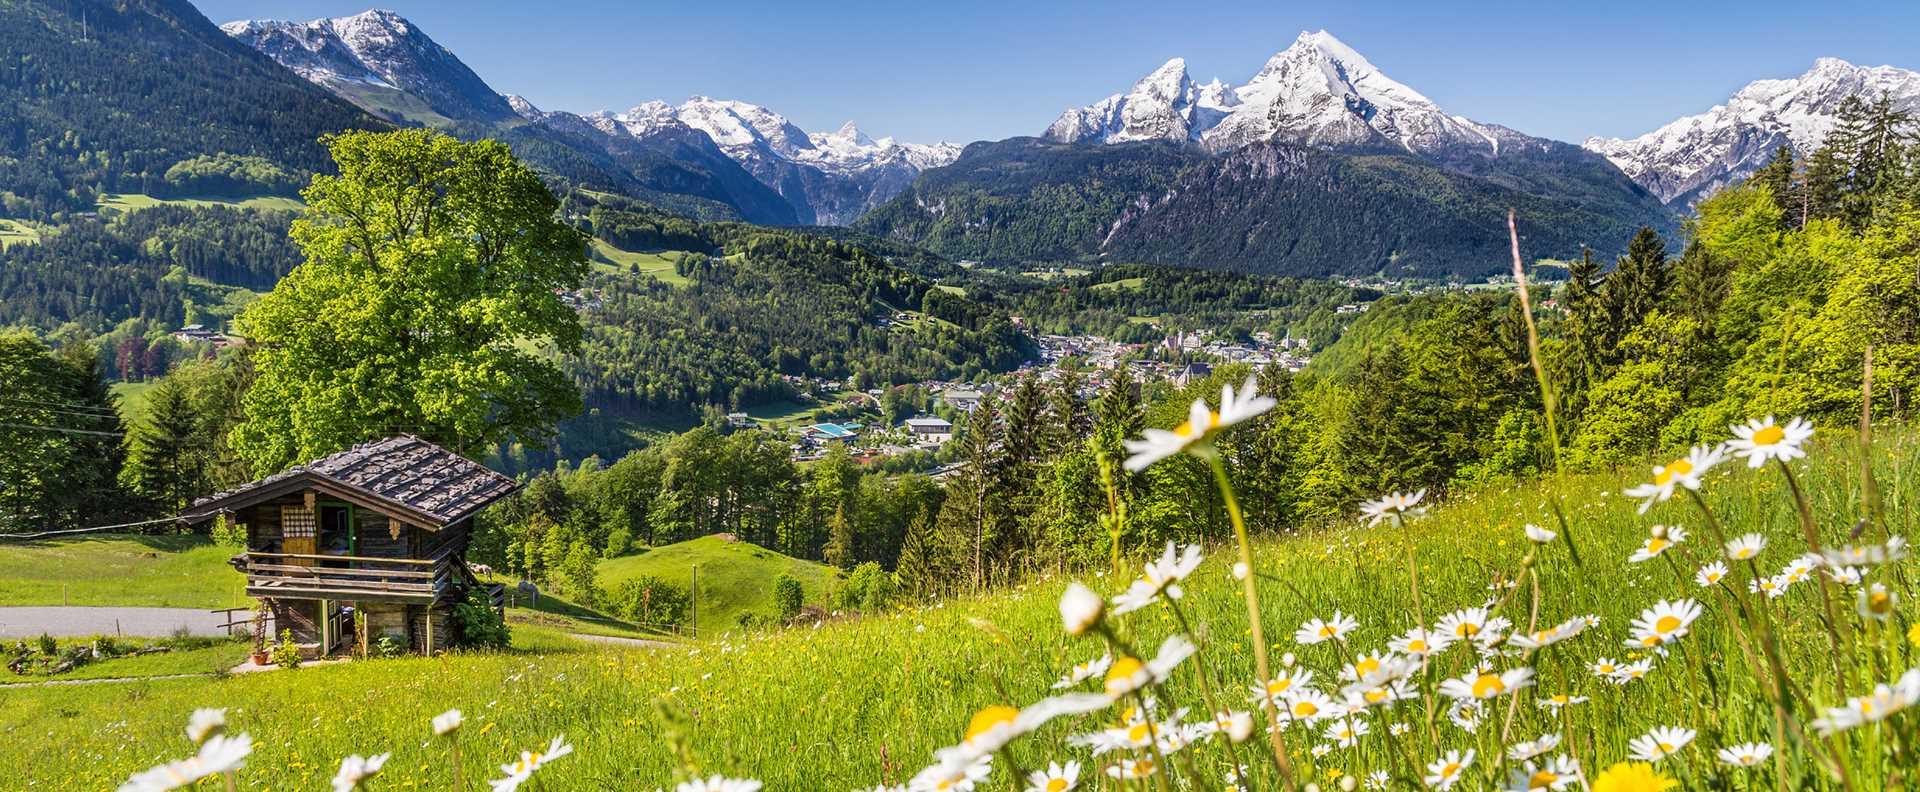 austria-tirol-house